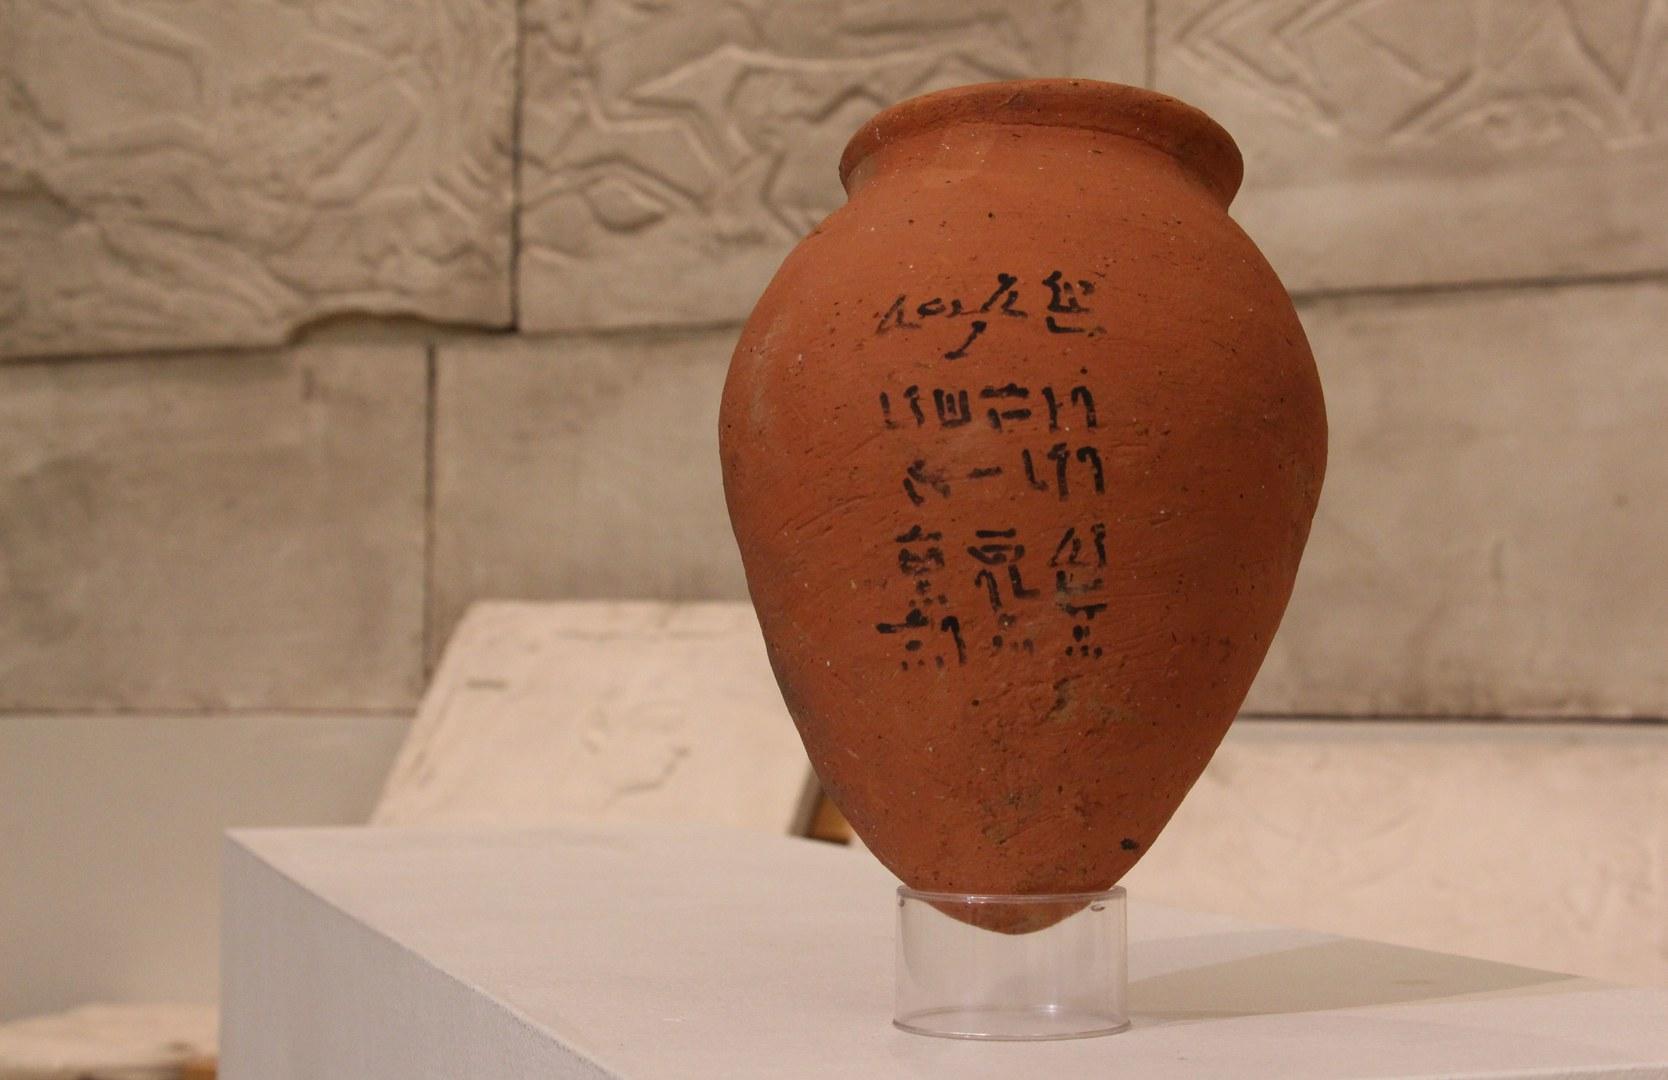 Keramikgefäß: Das Aktuelle Objekt